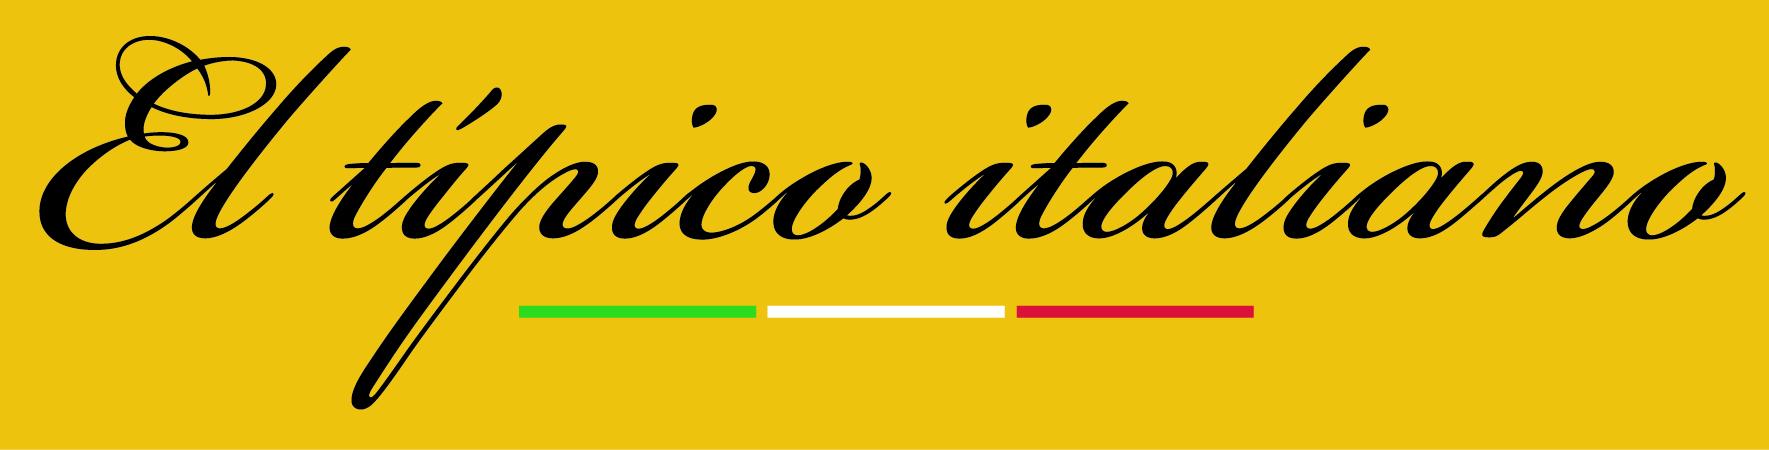 el Típico Italiano,s.l.u.